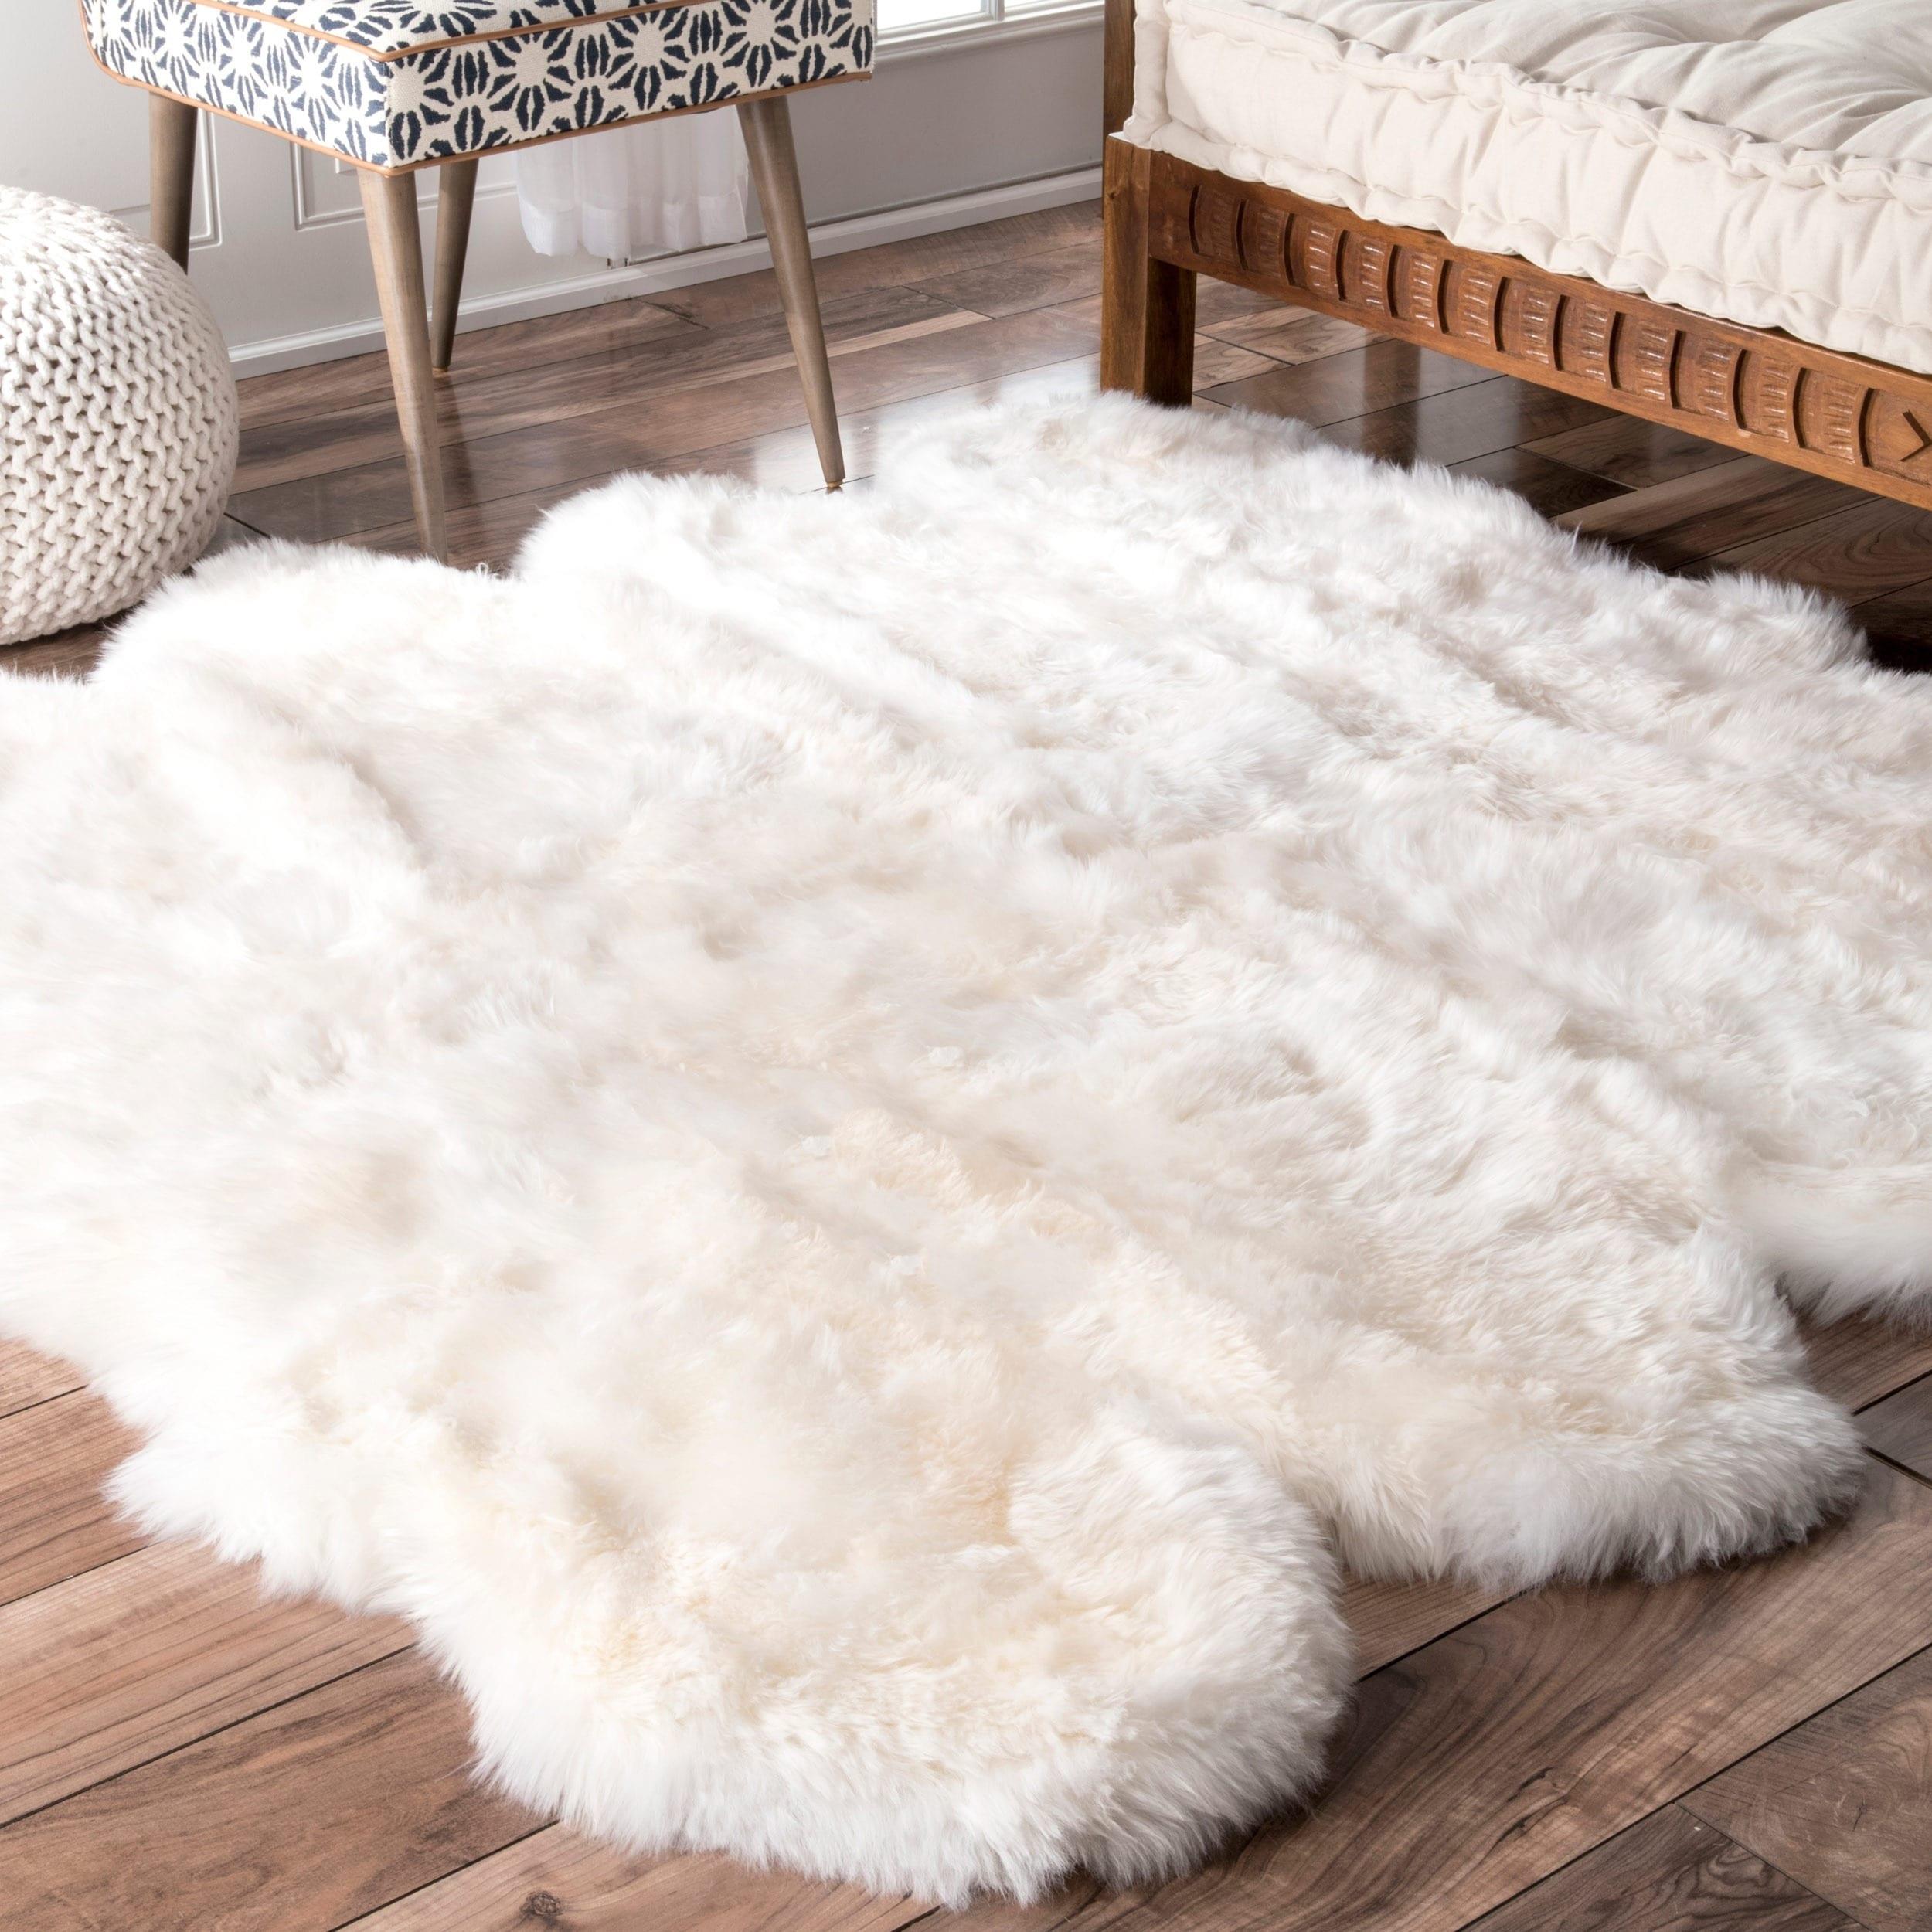 nuLOOM Alexa Octo Sheepskin Wool Eight Pelt Shag Rug, Nat...